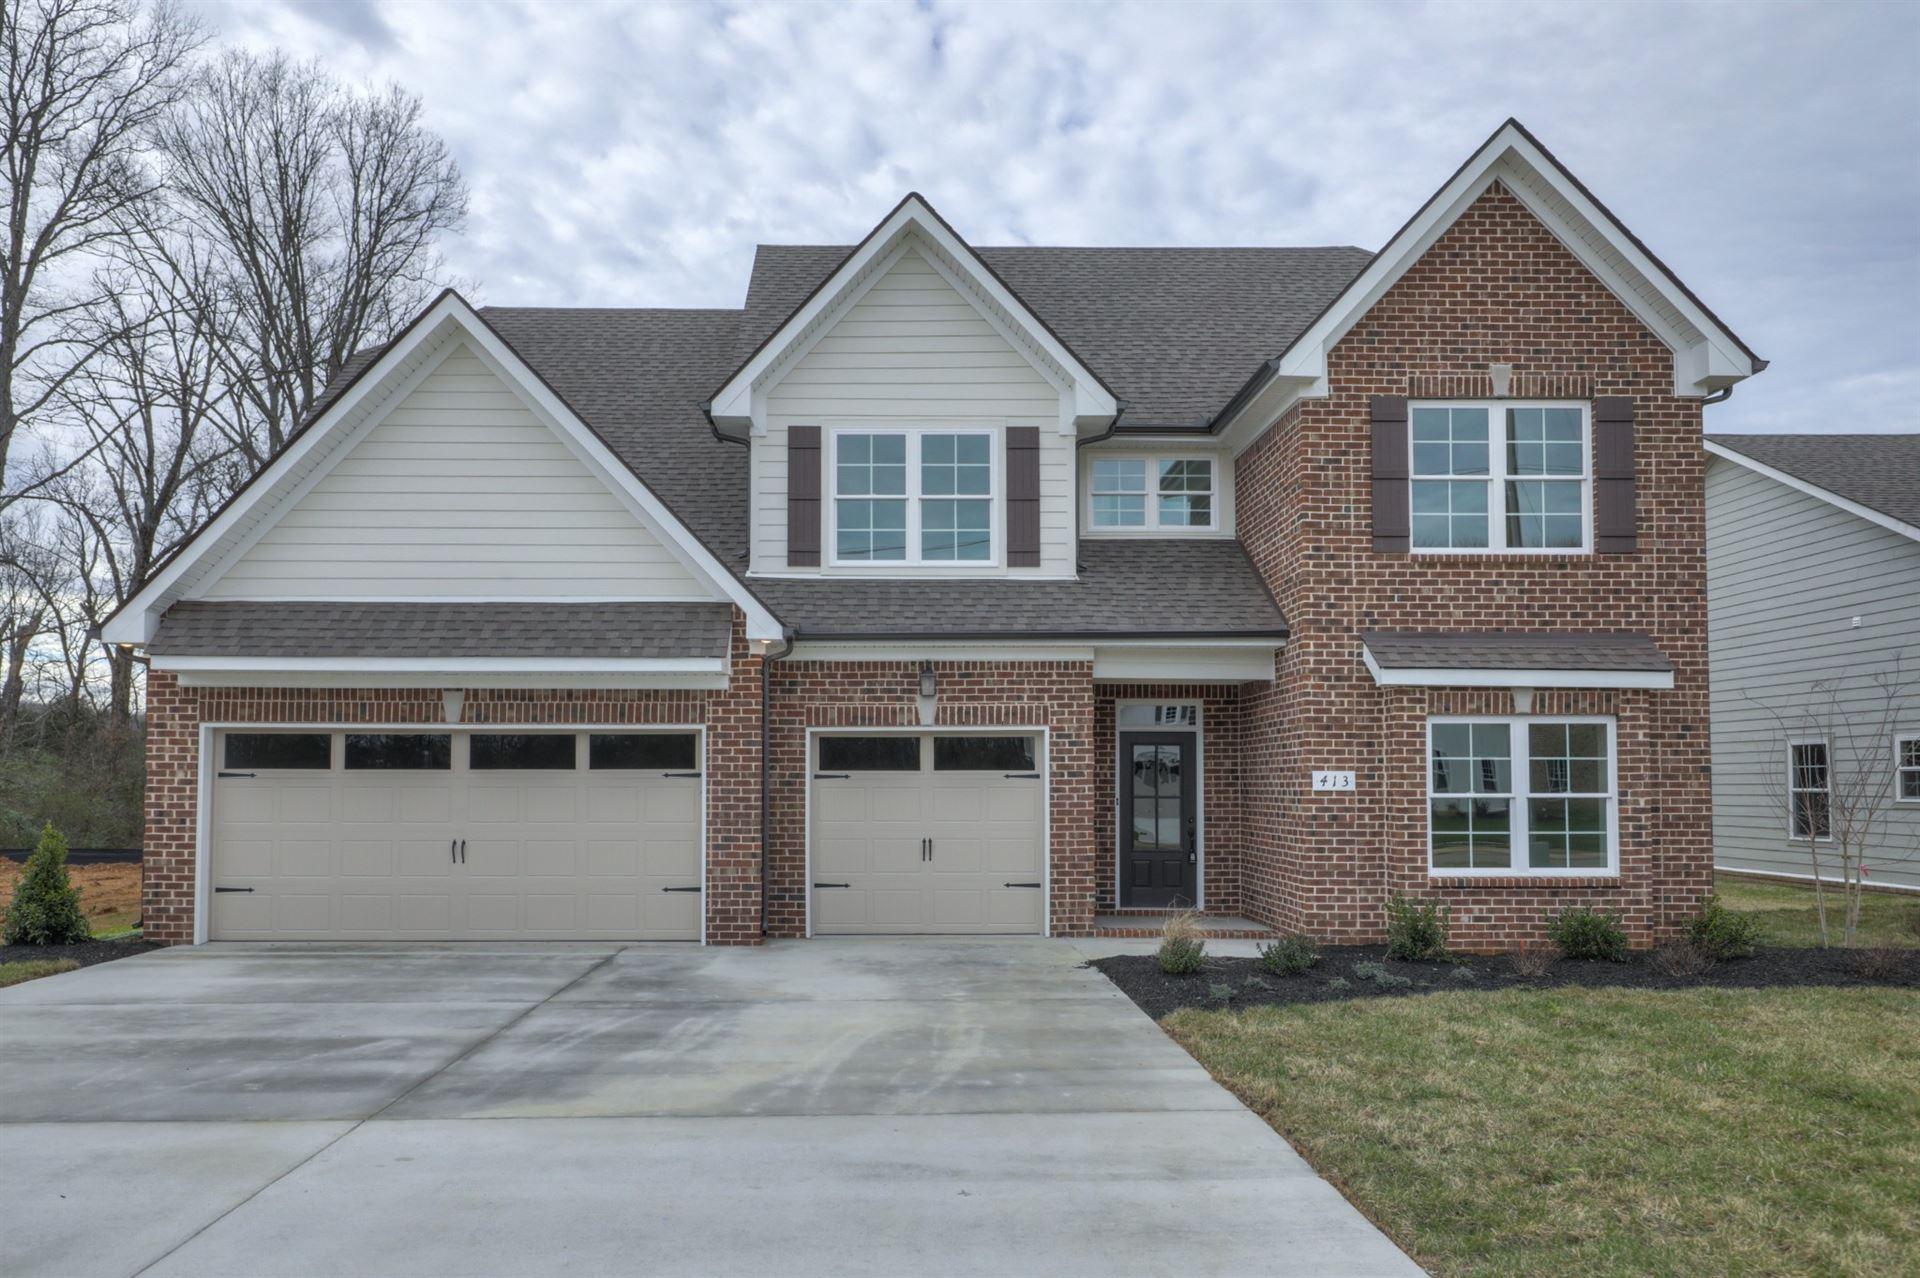 Photo of 1125 Kittywood Ct Lot 188, Murfreesboro, TN 37129 (MLS # 2275678)